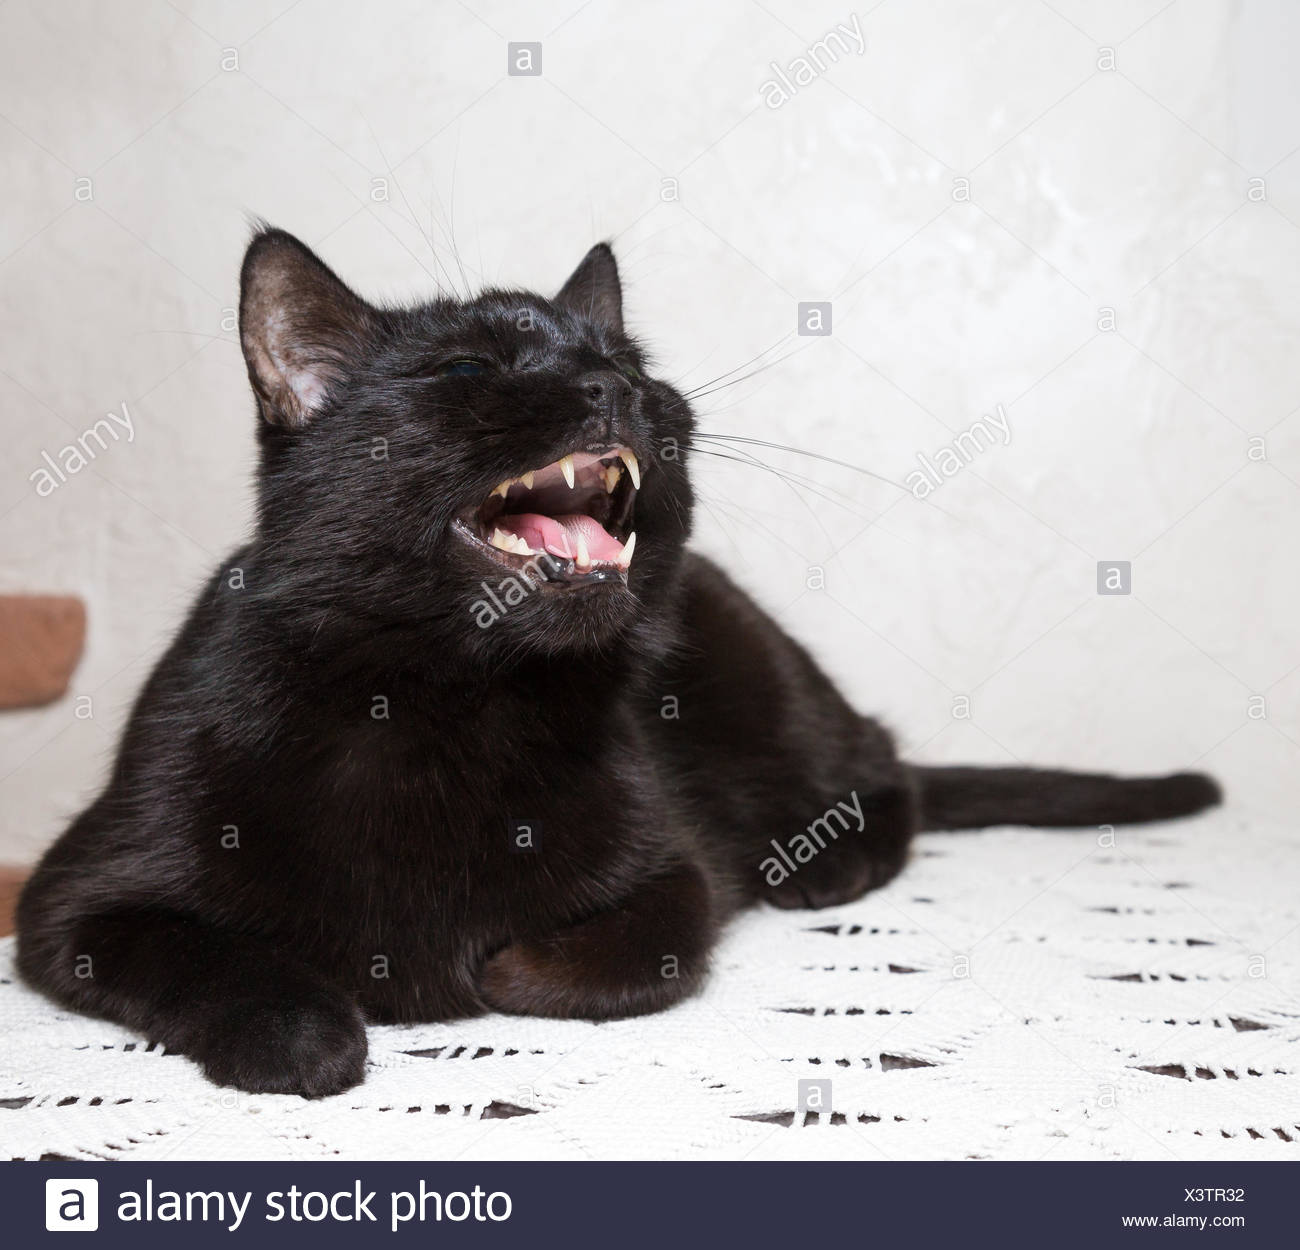 black cat growls - Stock Image